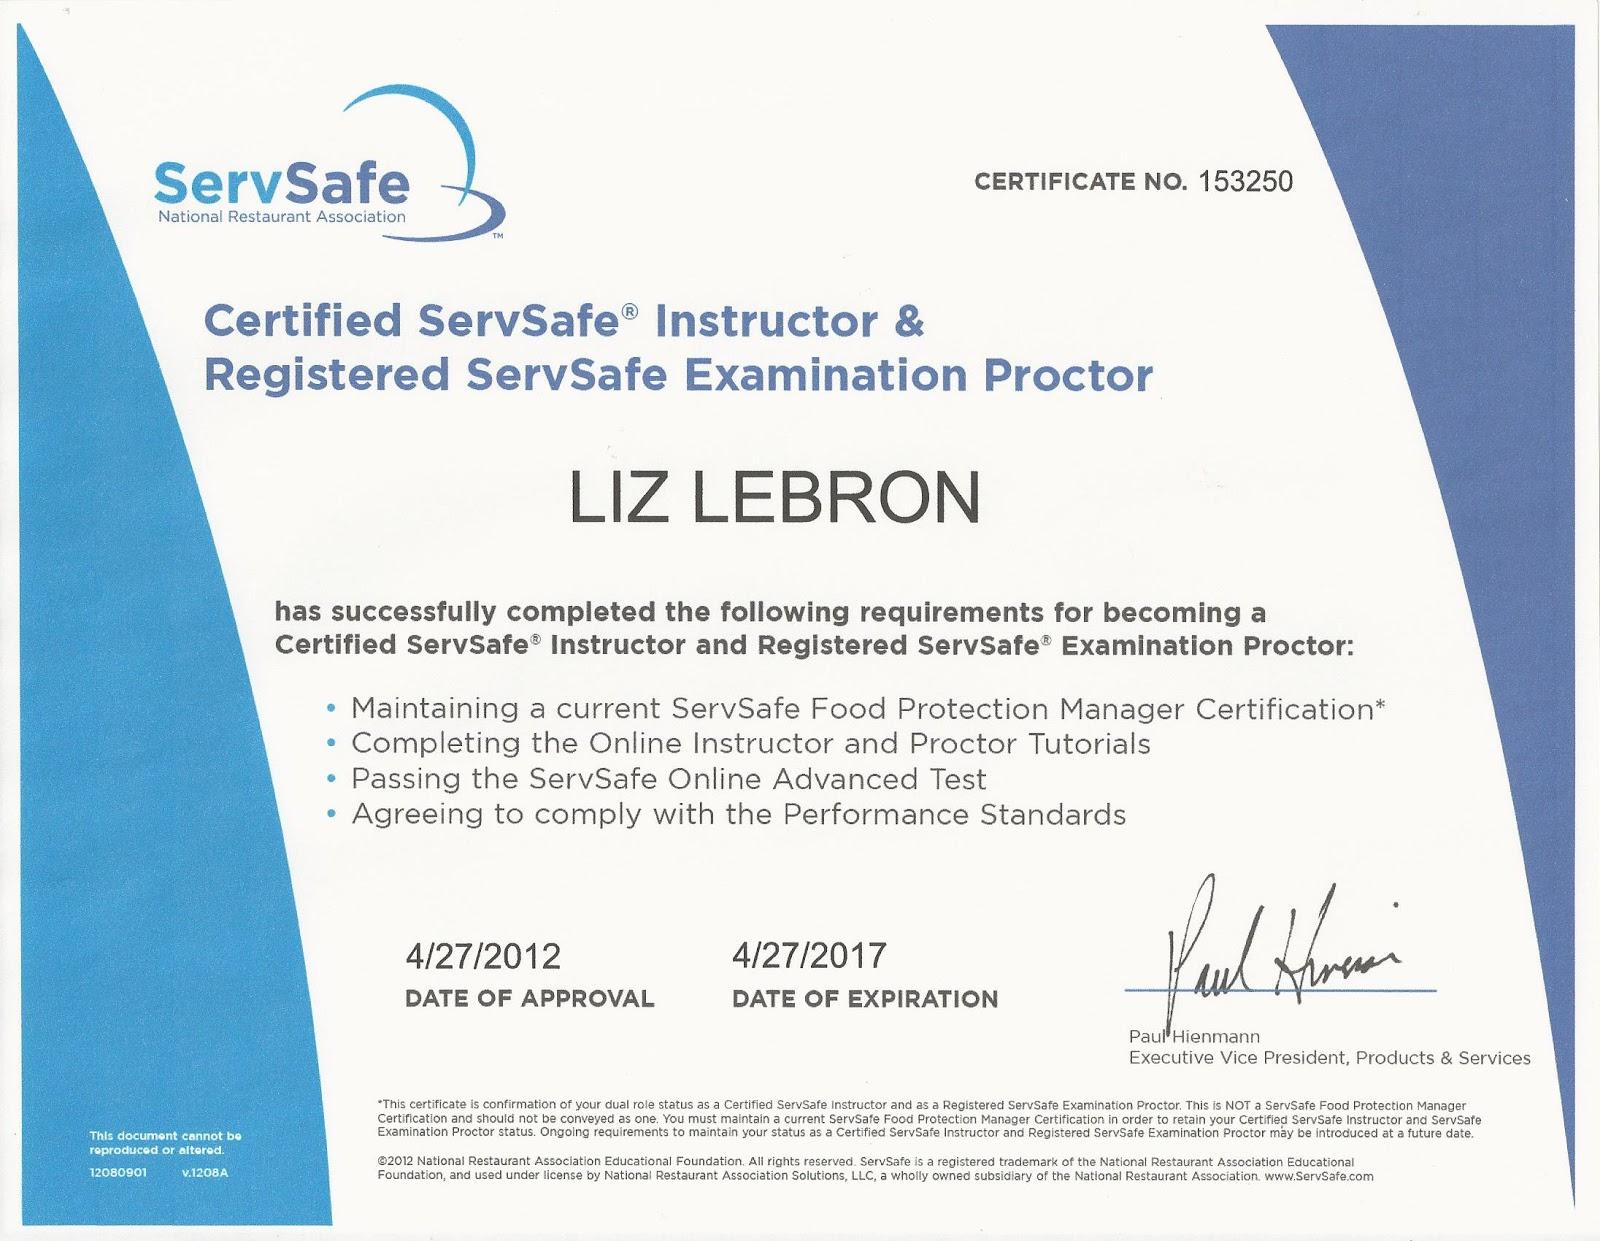 Servsafe Certification Tampa | TUTORE.ORG - Master of ...